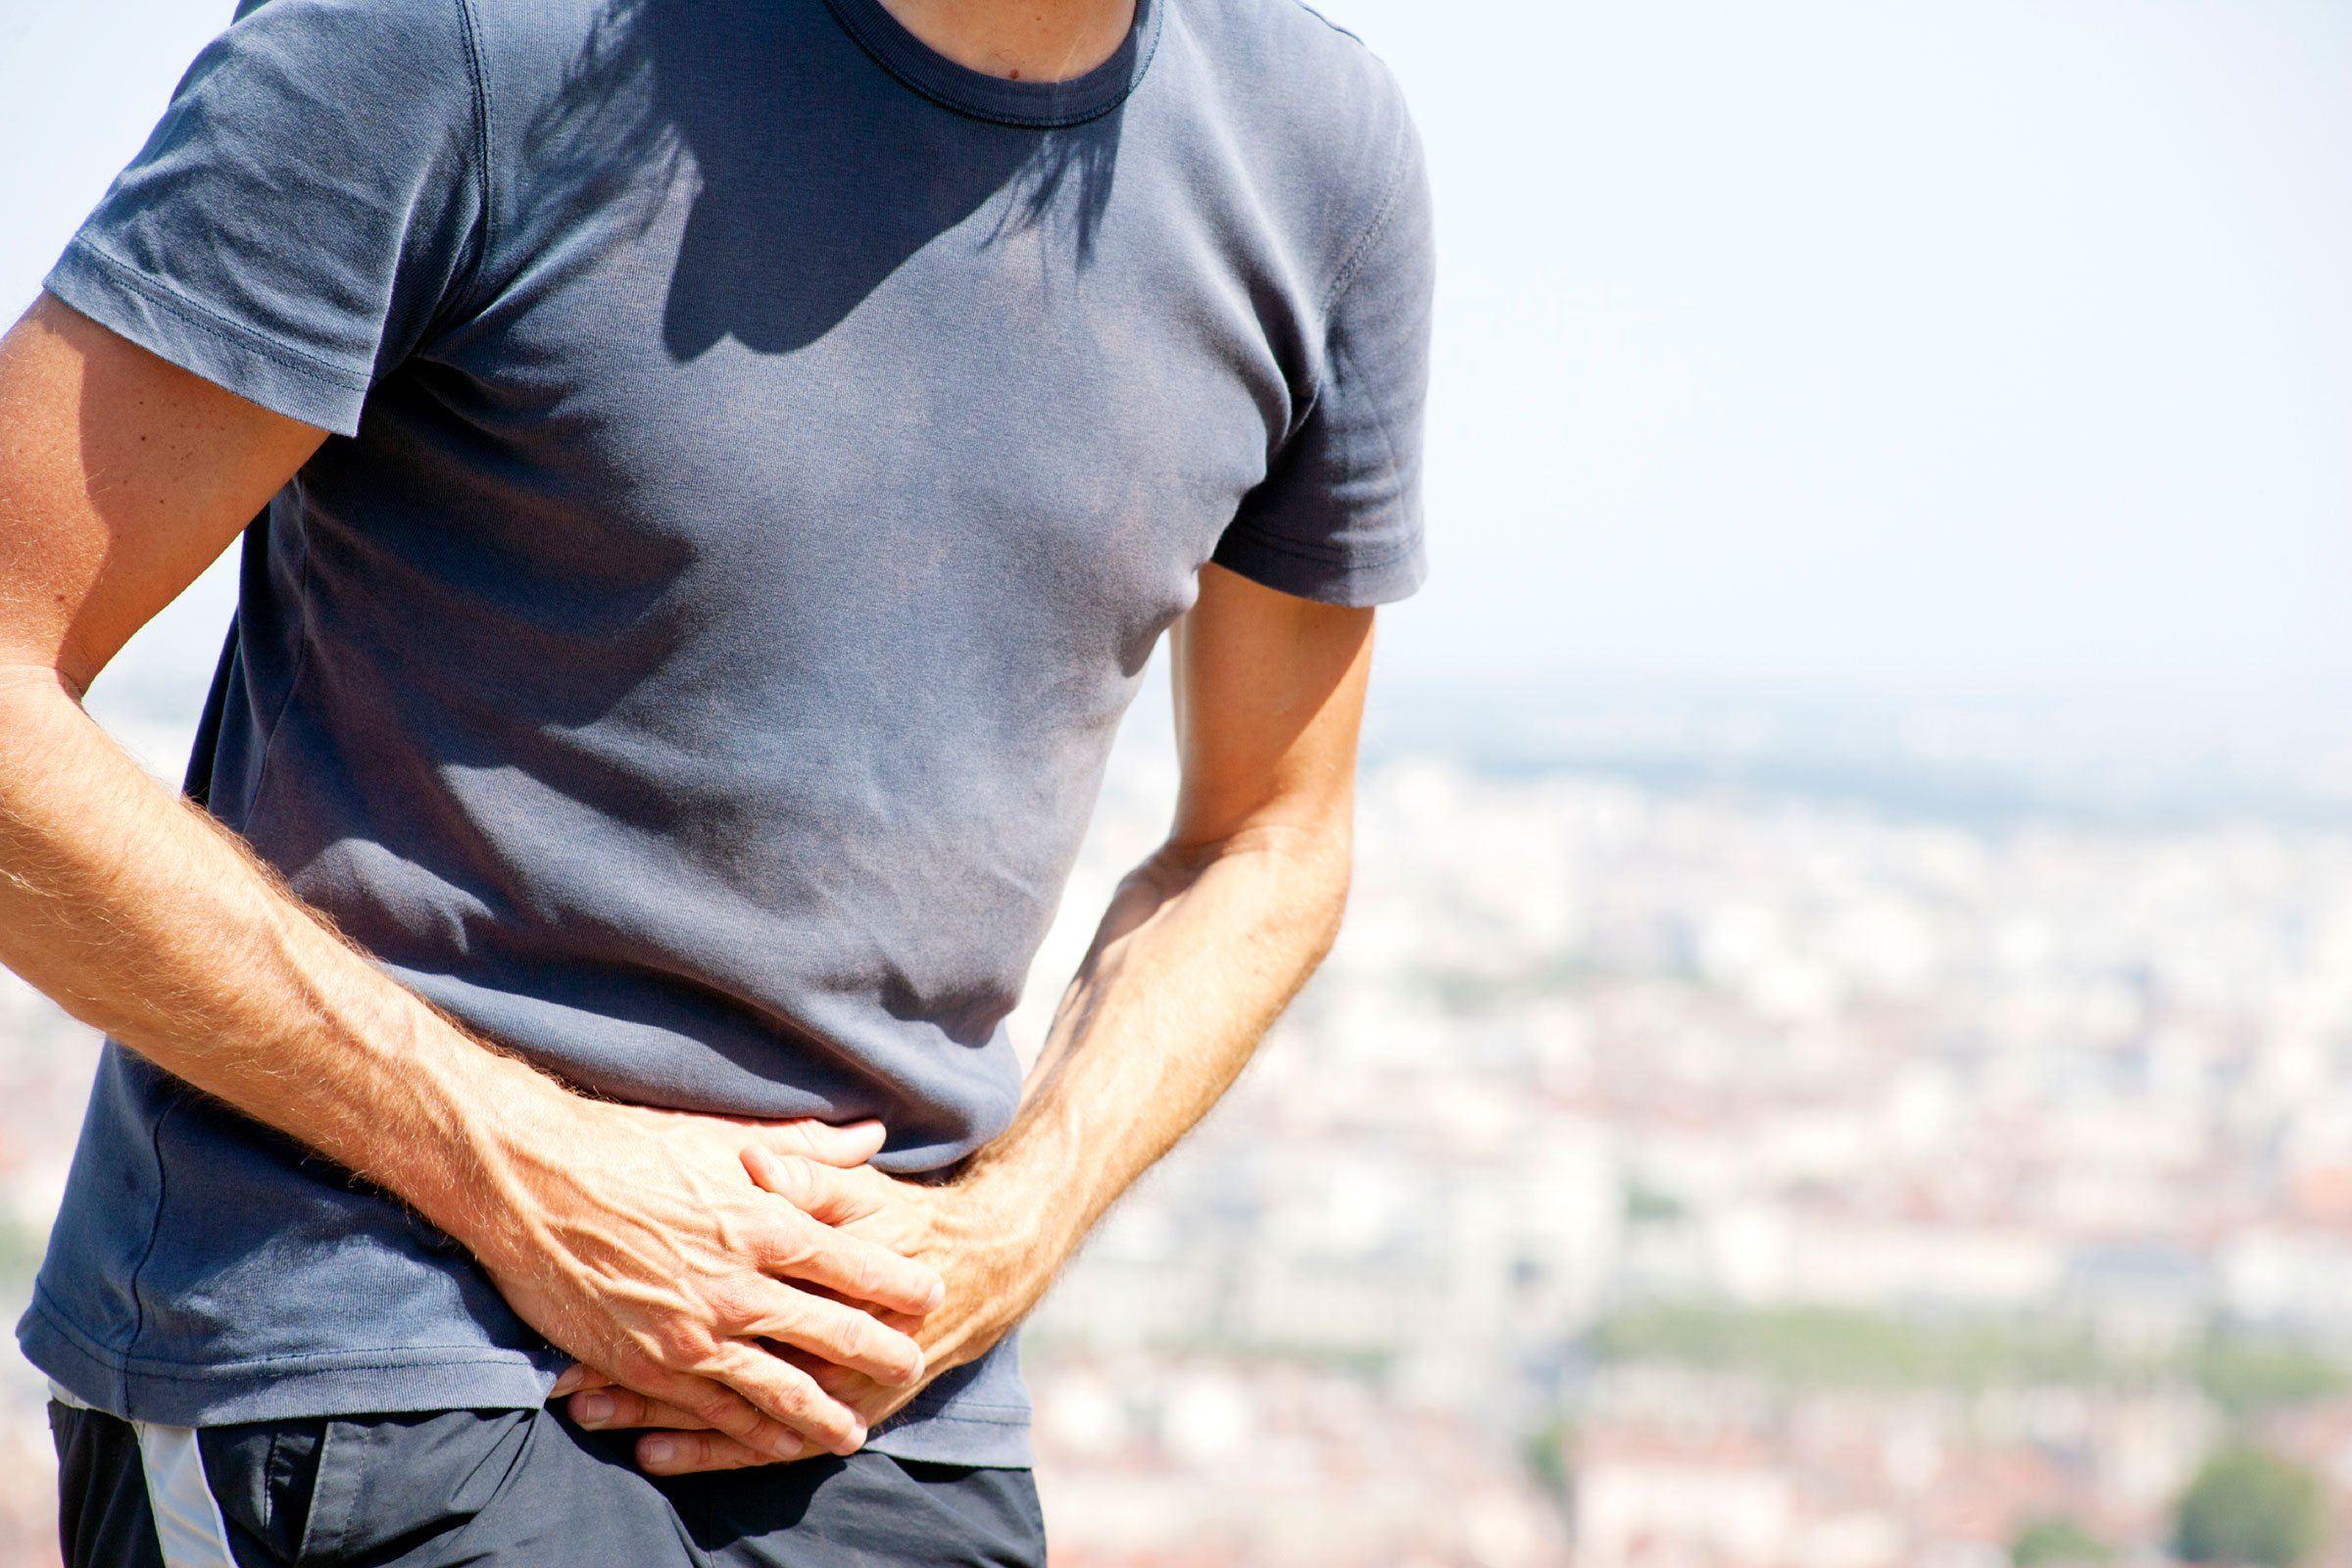 ramai percaya mitos kacang soya punca kanser prostat lelaki